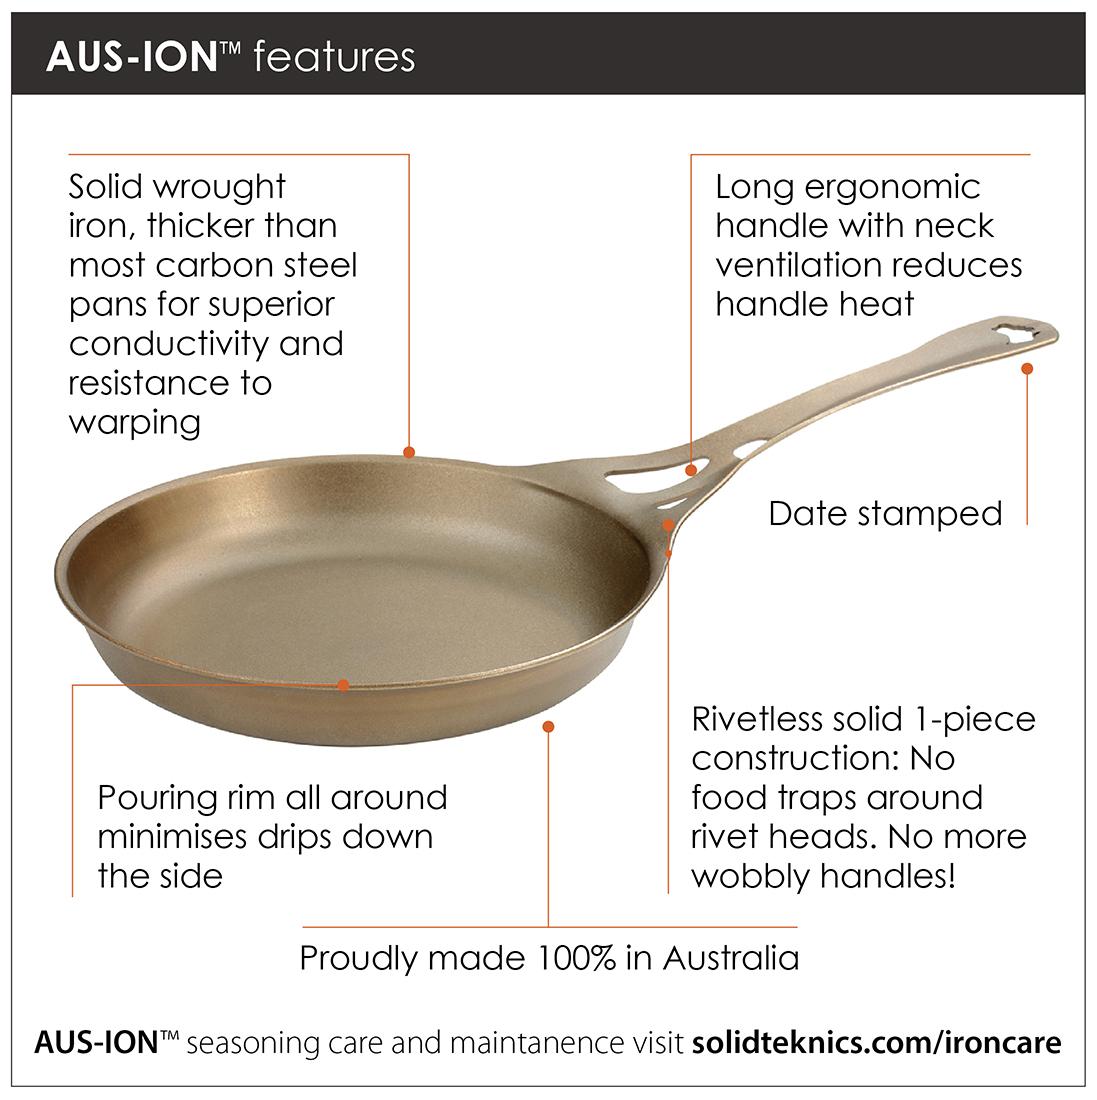 AUS-ION_features.jpg